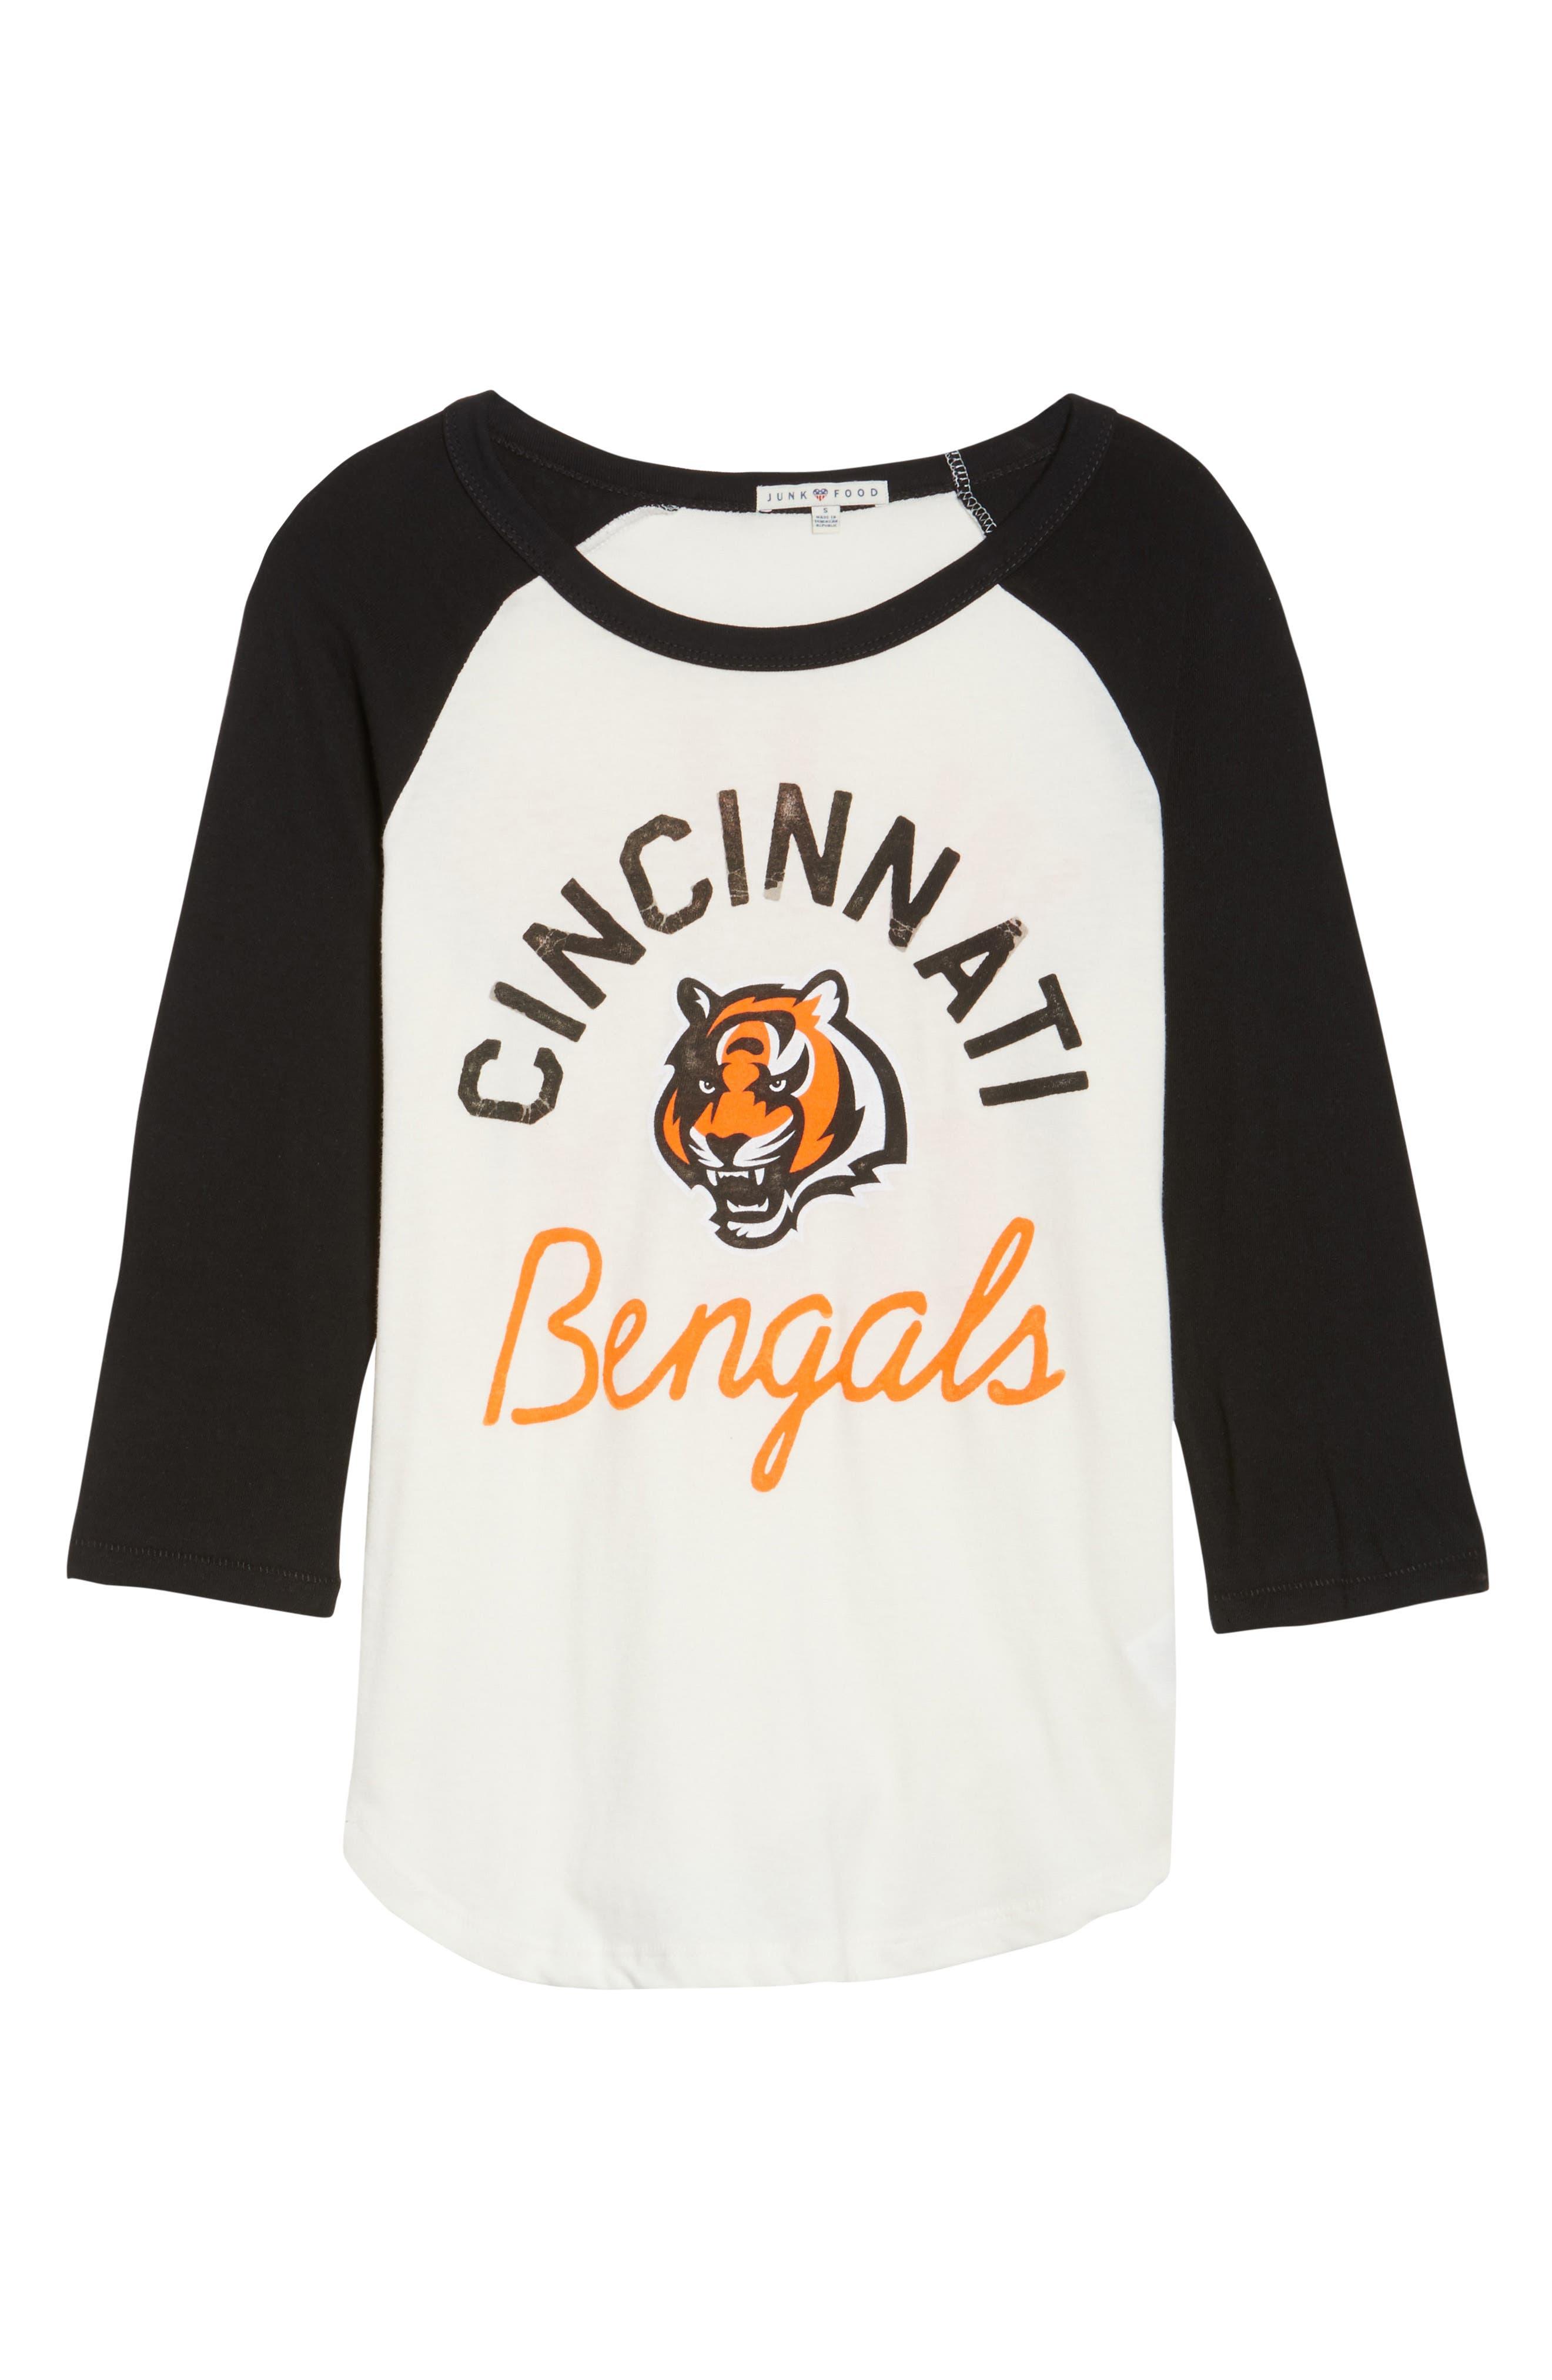 NFL Cincinnati Bengals Raglan Tee,                             Alternate thumbnail 6, color,                             189